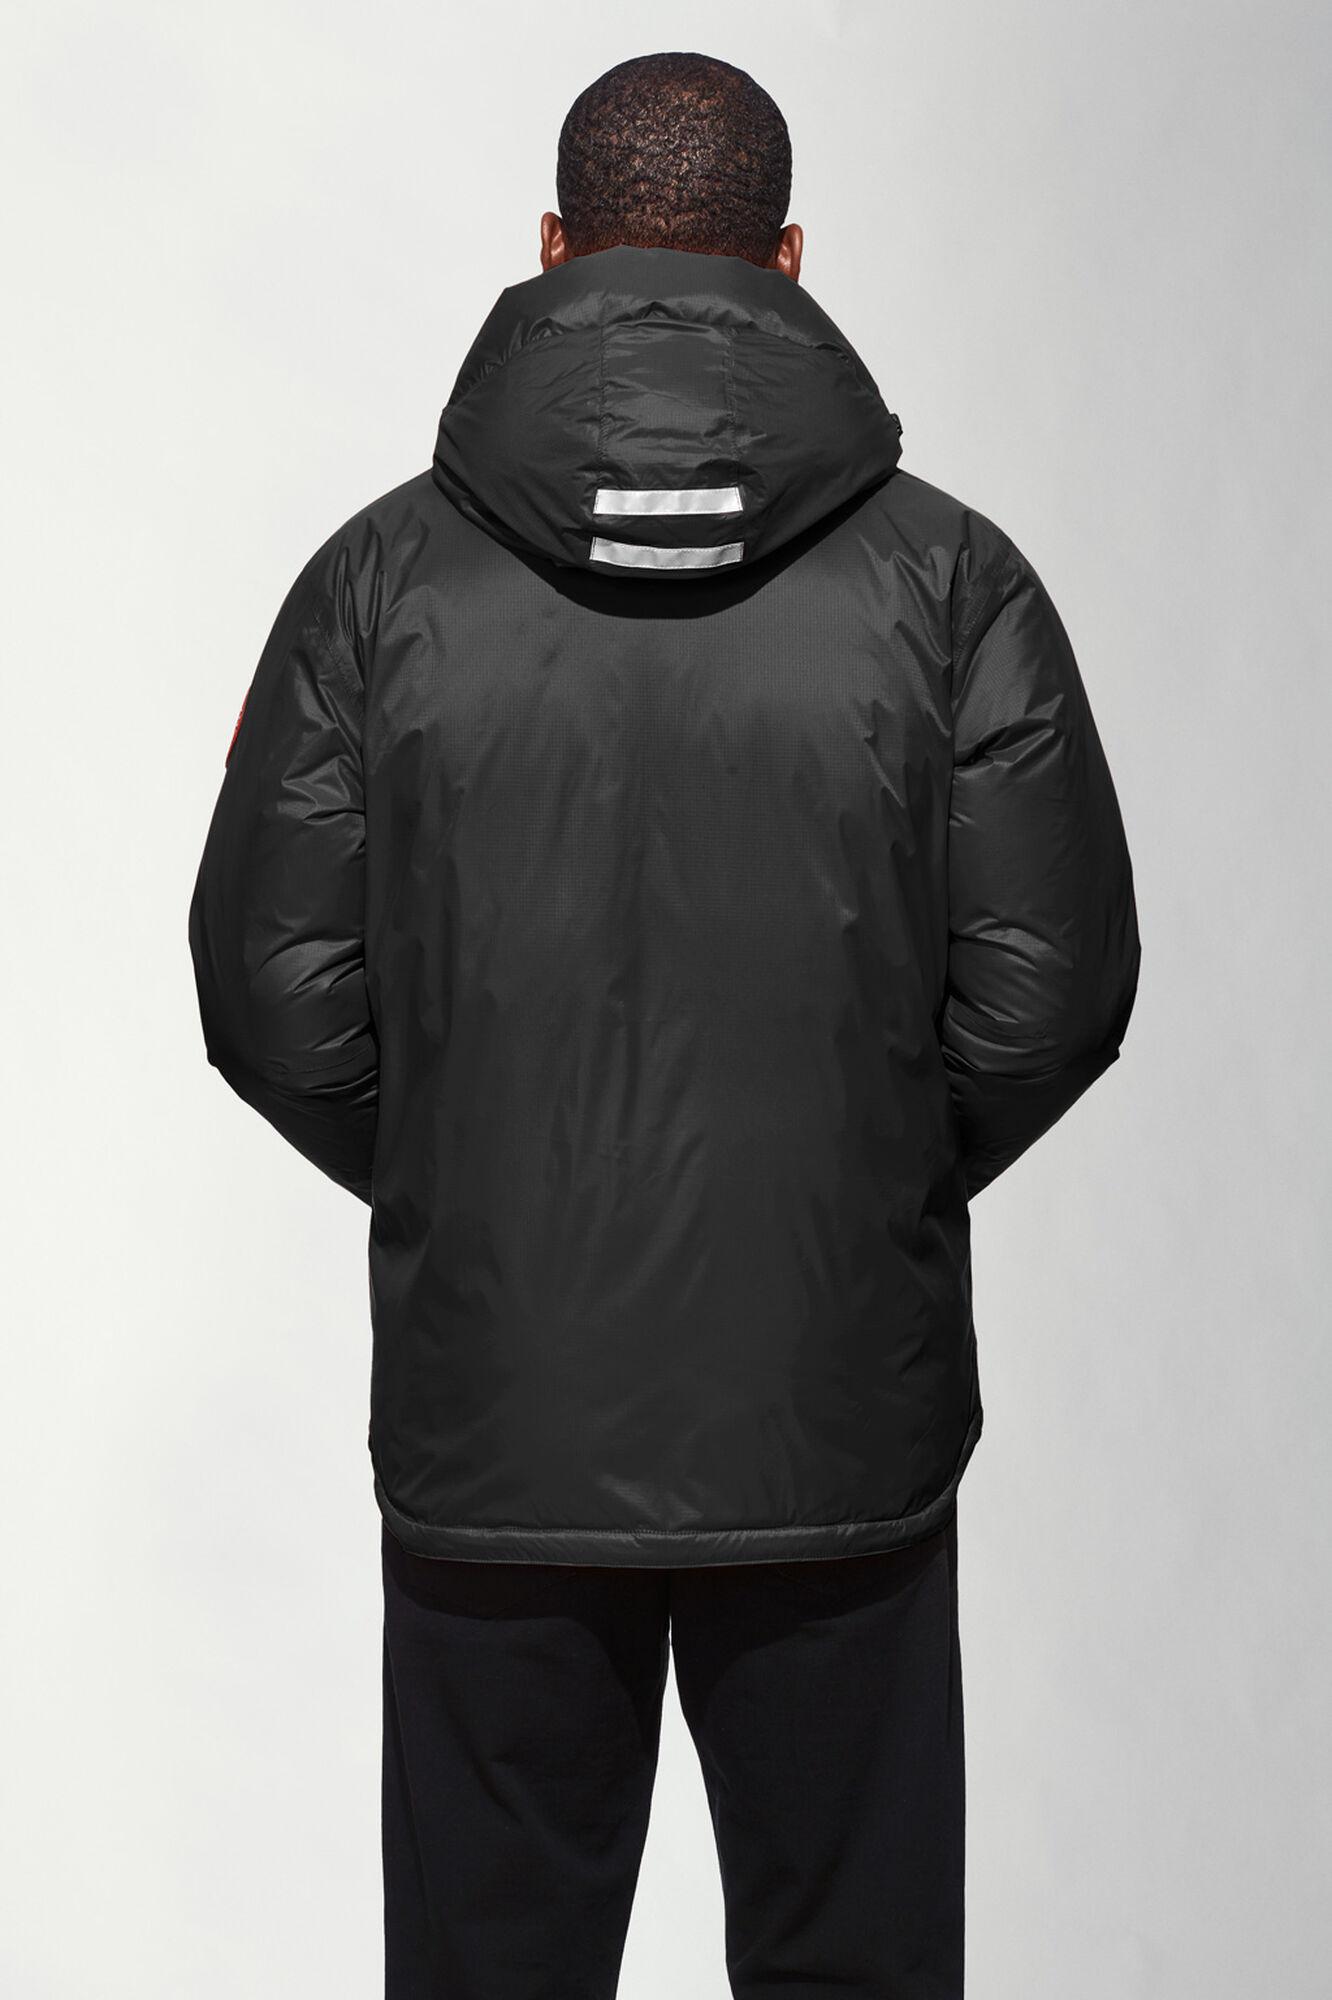 mountaineer jacket canada goose. Black Bedroom Furniture Sets. Home Design Ideas